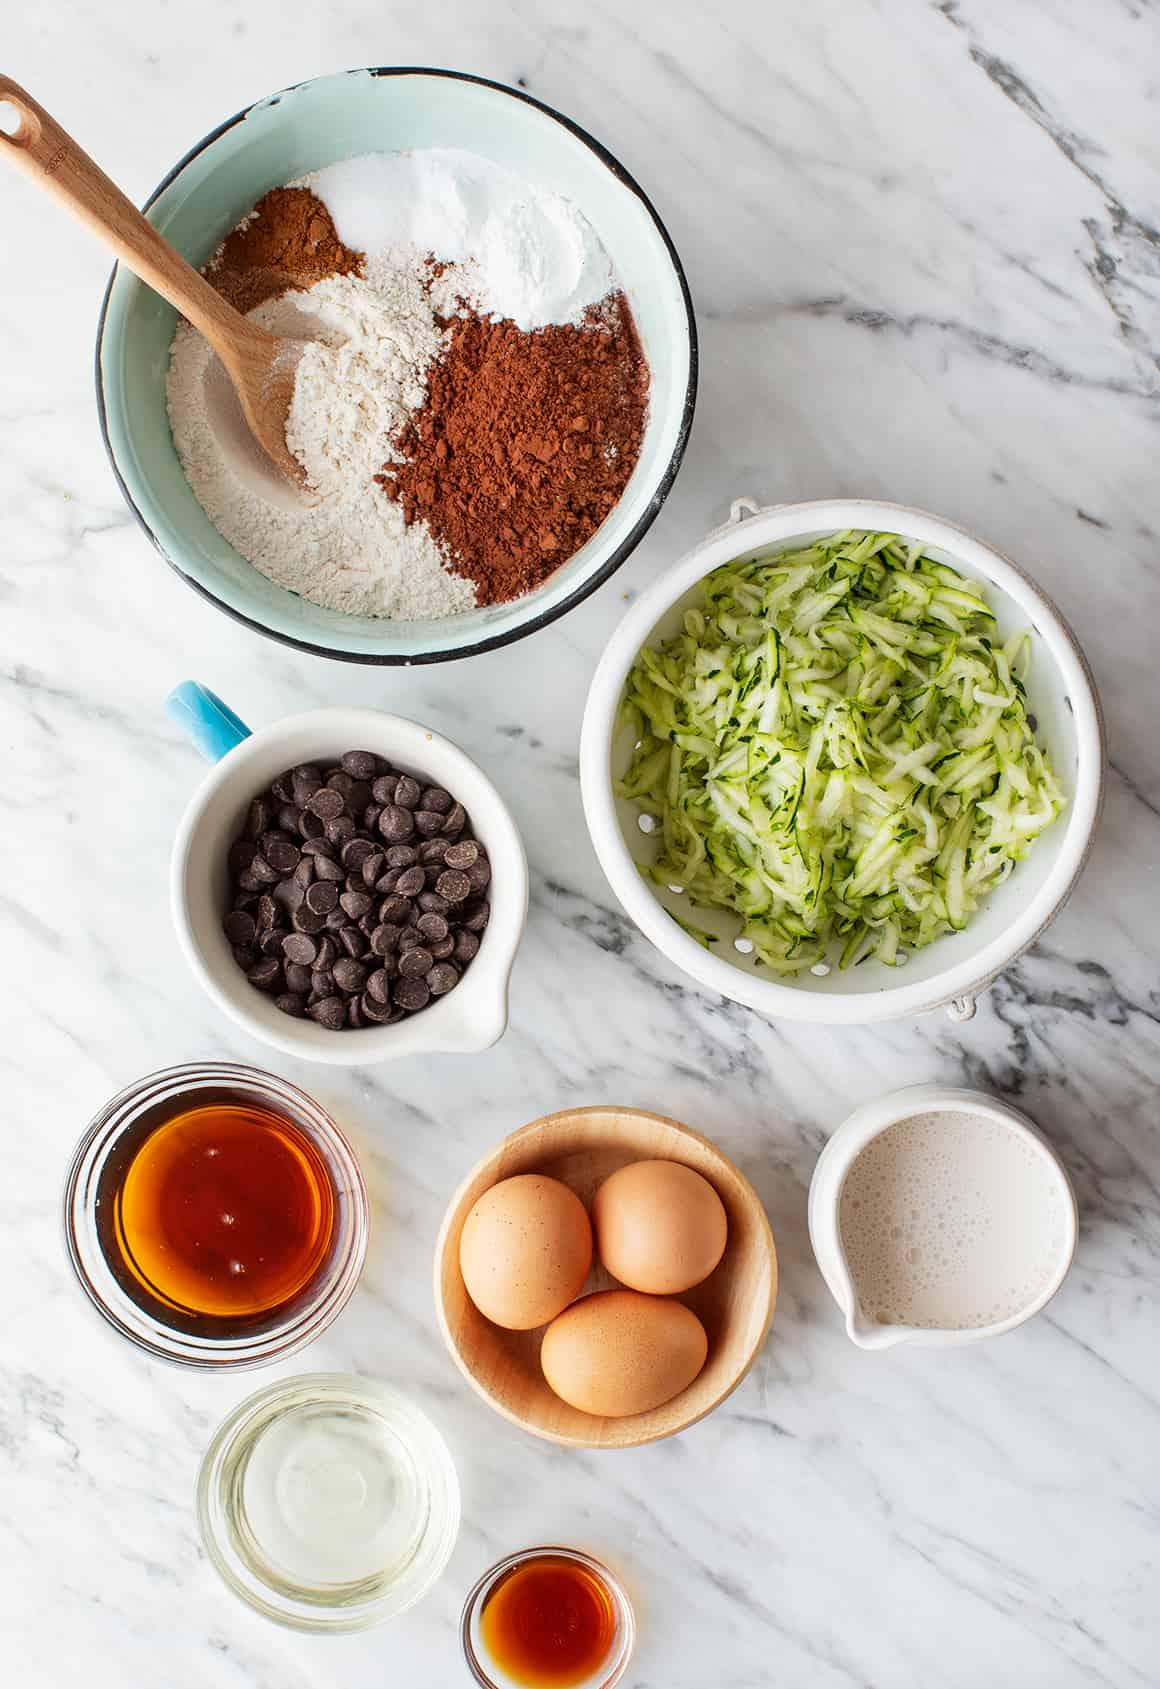 Chocolate zucchini bread recipe ingredients